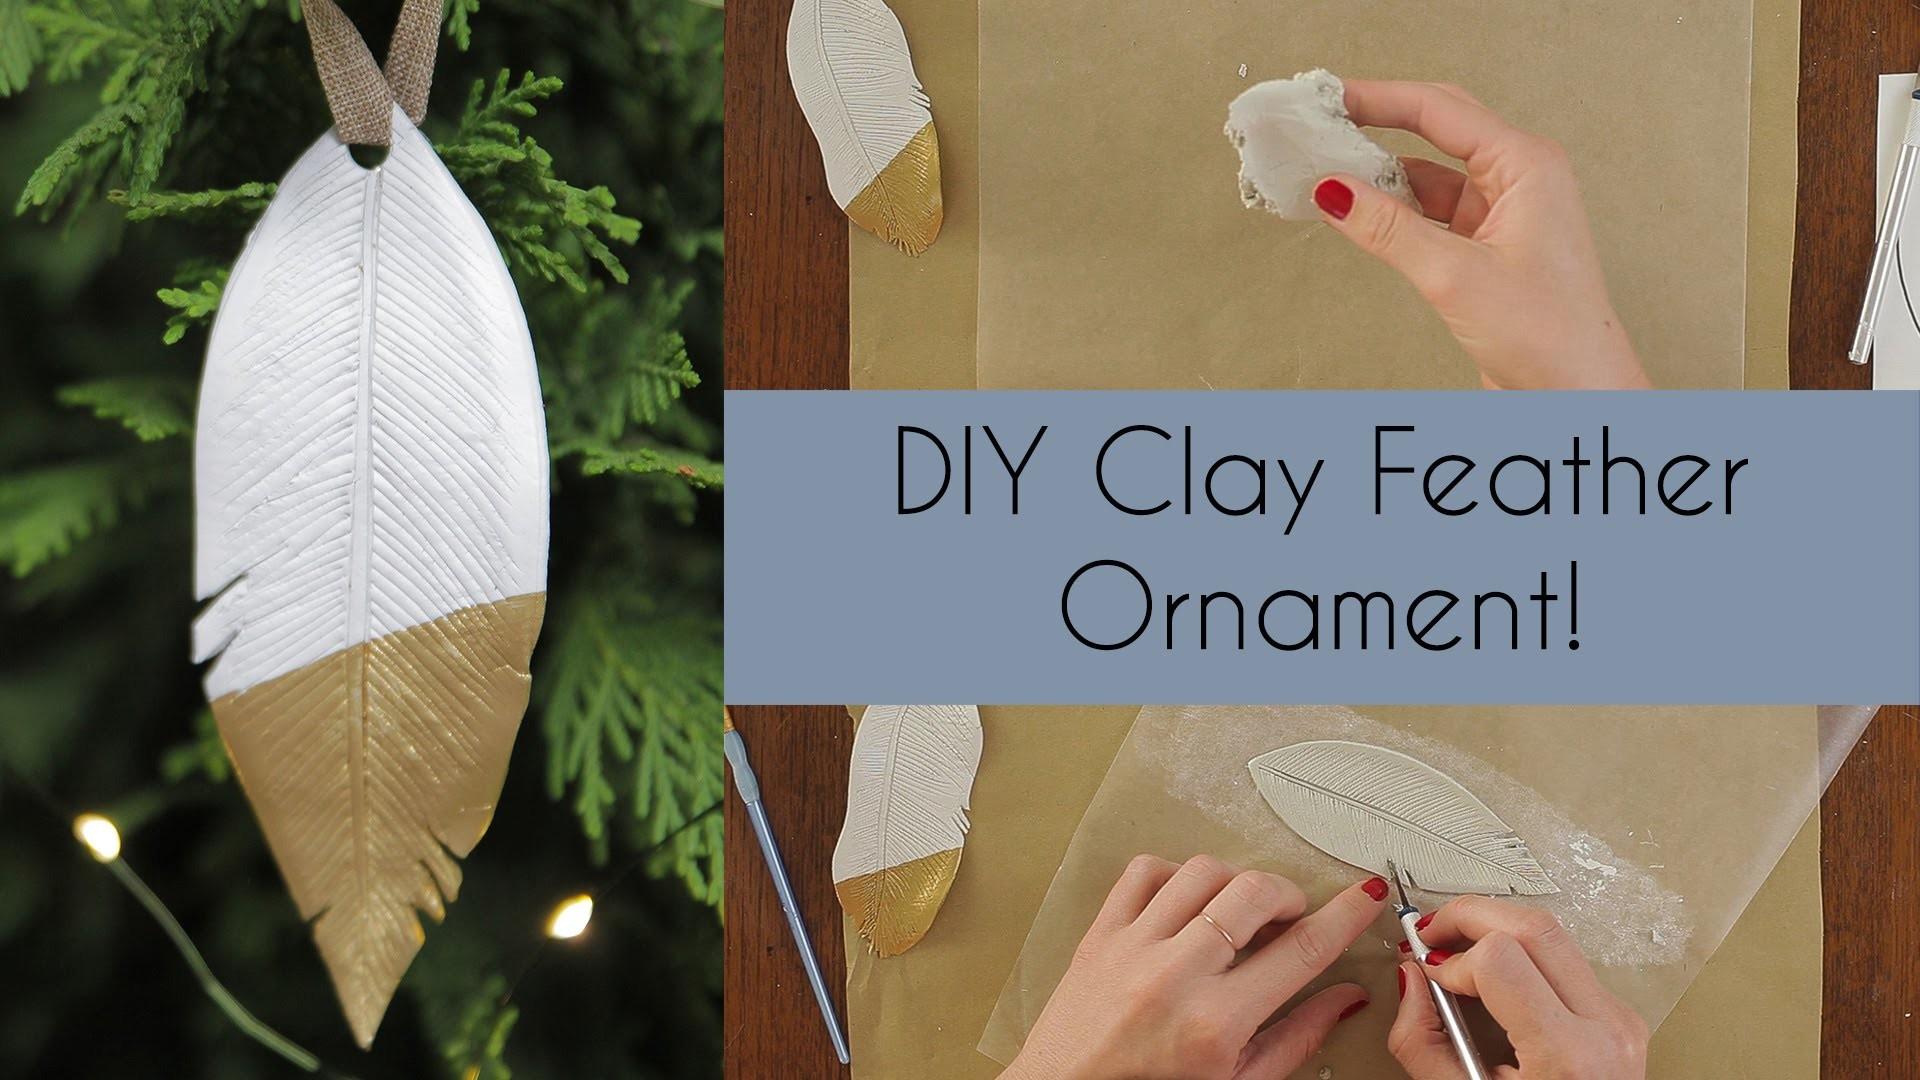 DIY Clay Feather Ornament